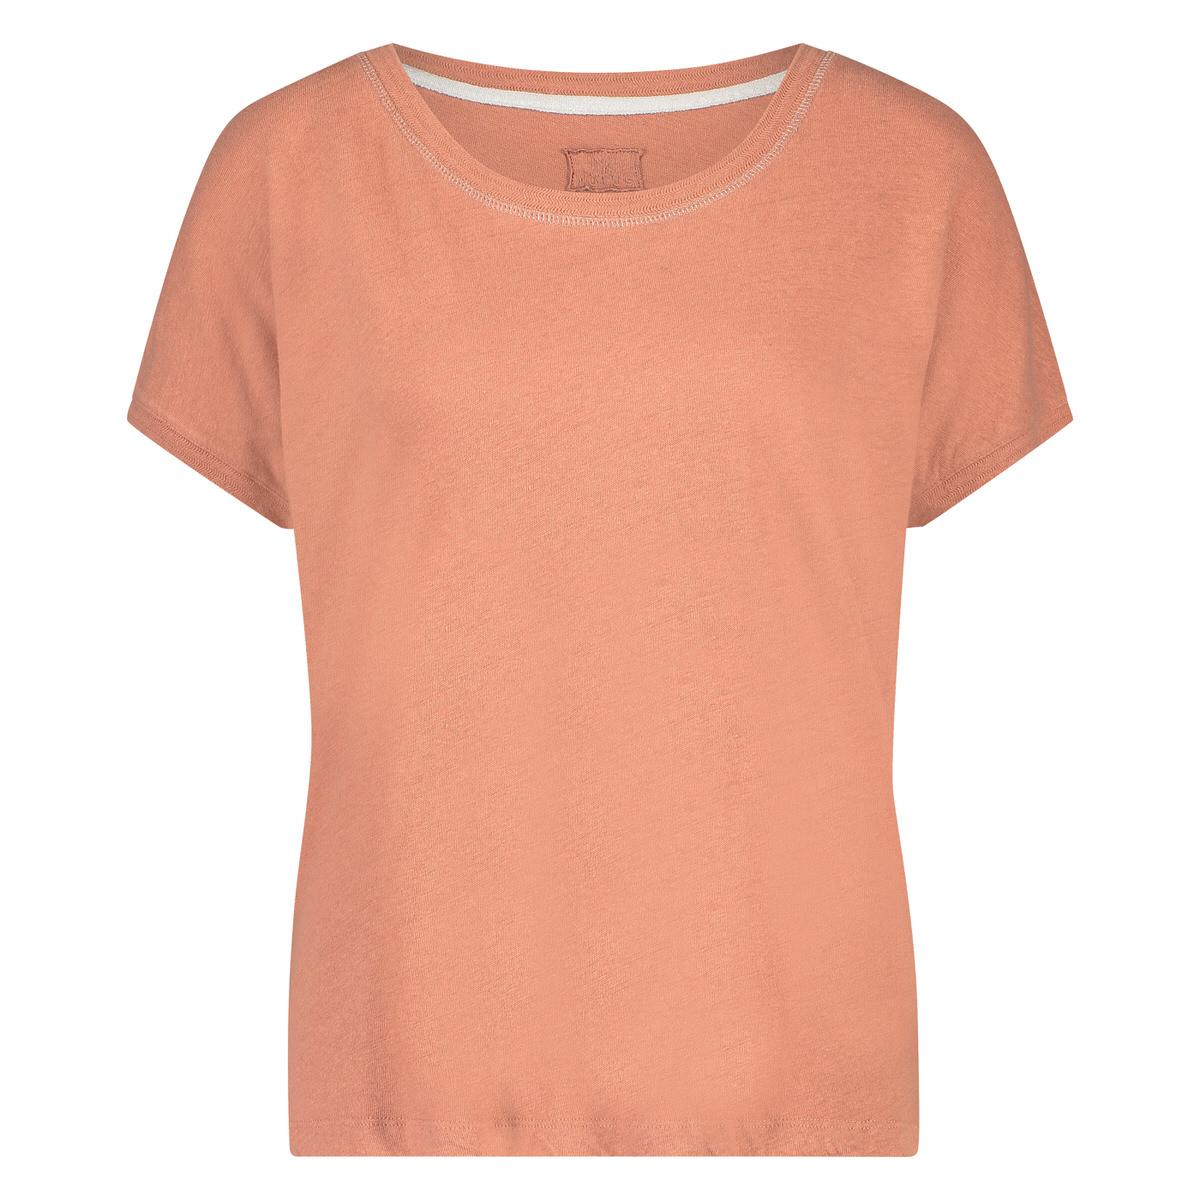 Servia T-shirt - Frizzy melon